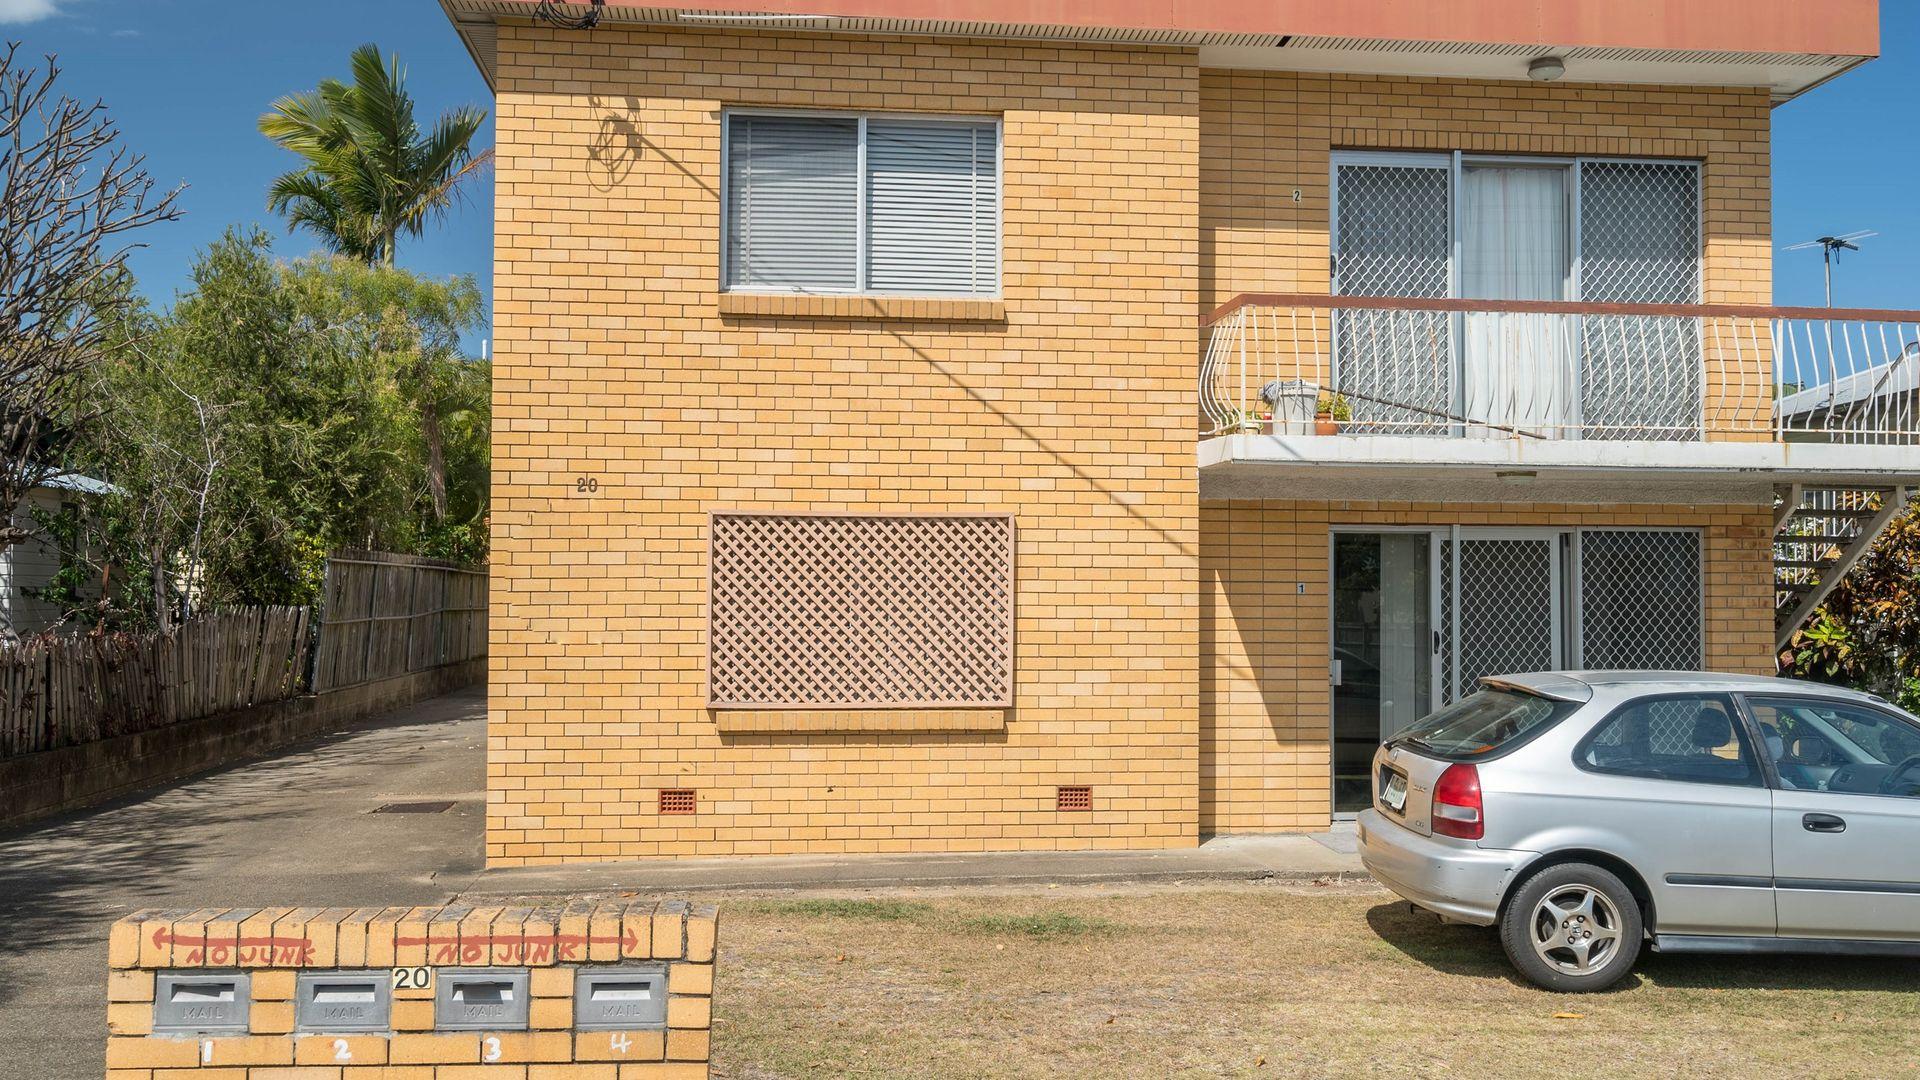 3/20 Broughton Road, Kedron QLD 4031, Image 6